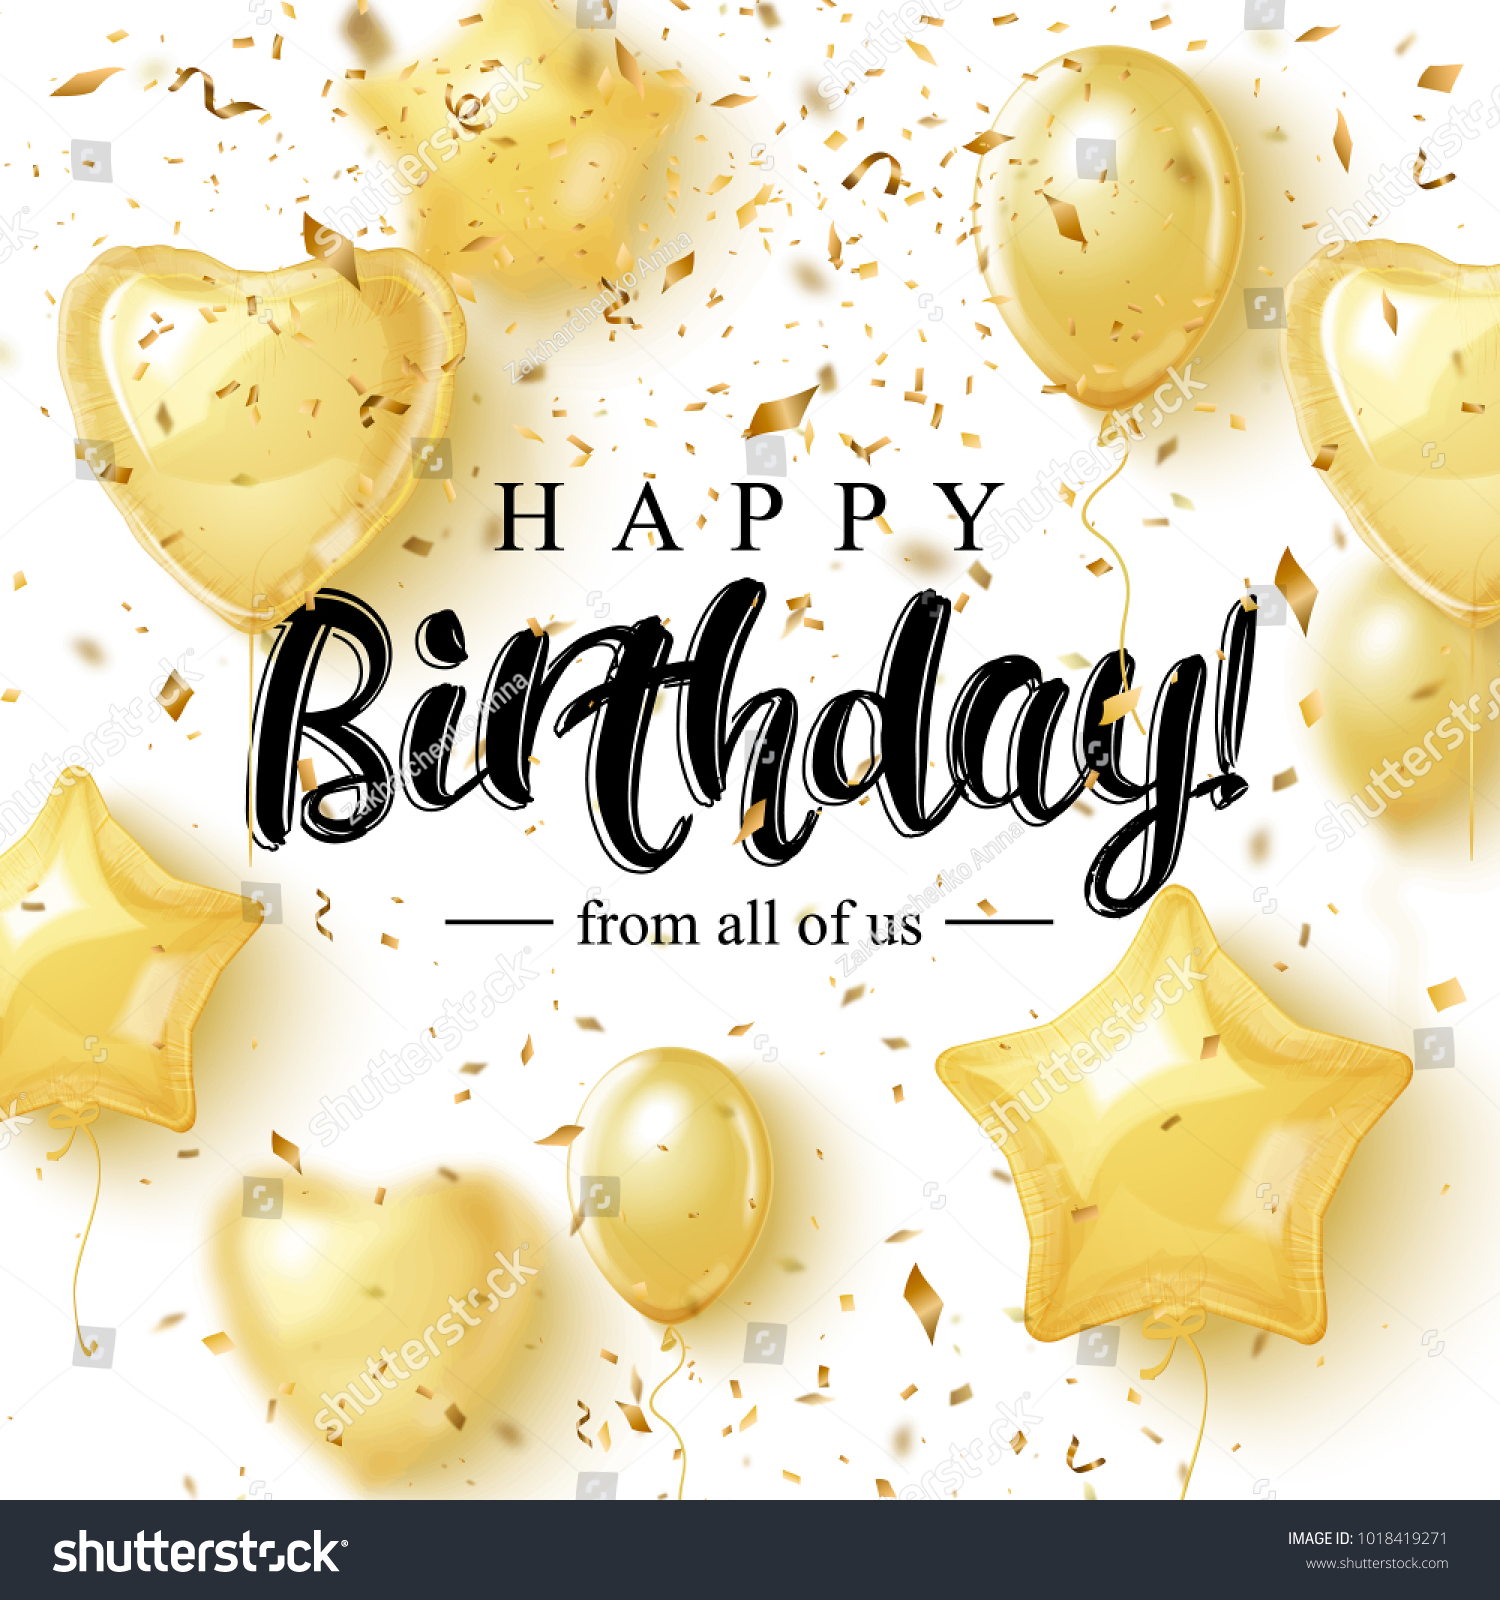 Happy Birthday Greeting Card Design Golden Image Vectorielle De